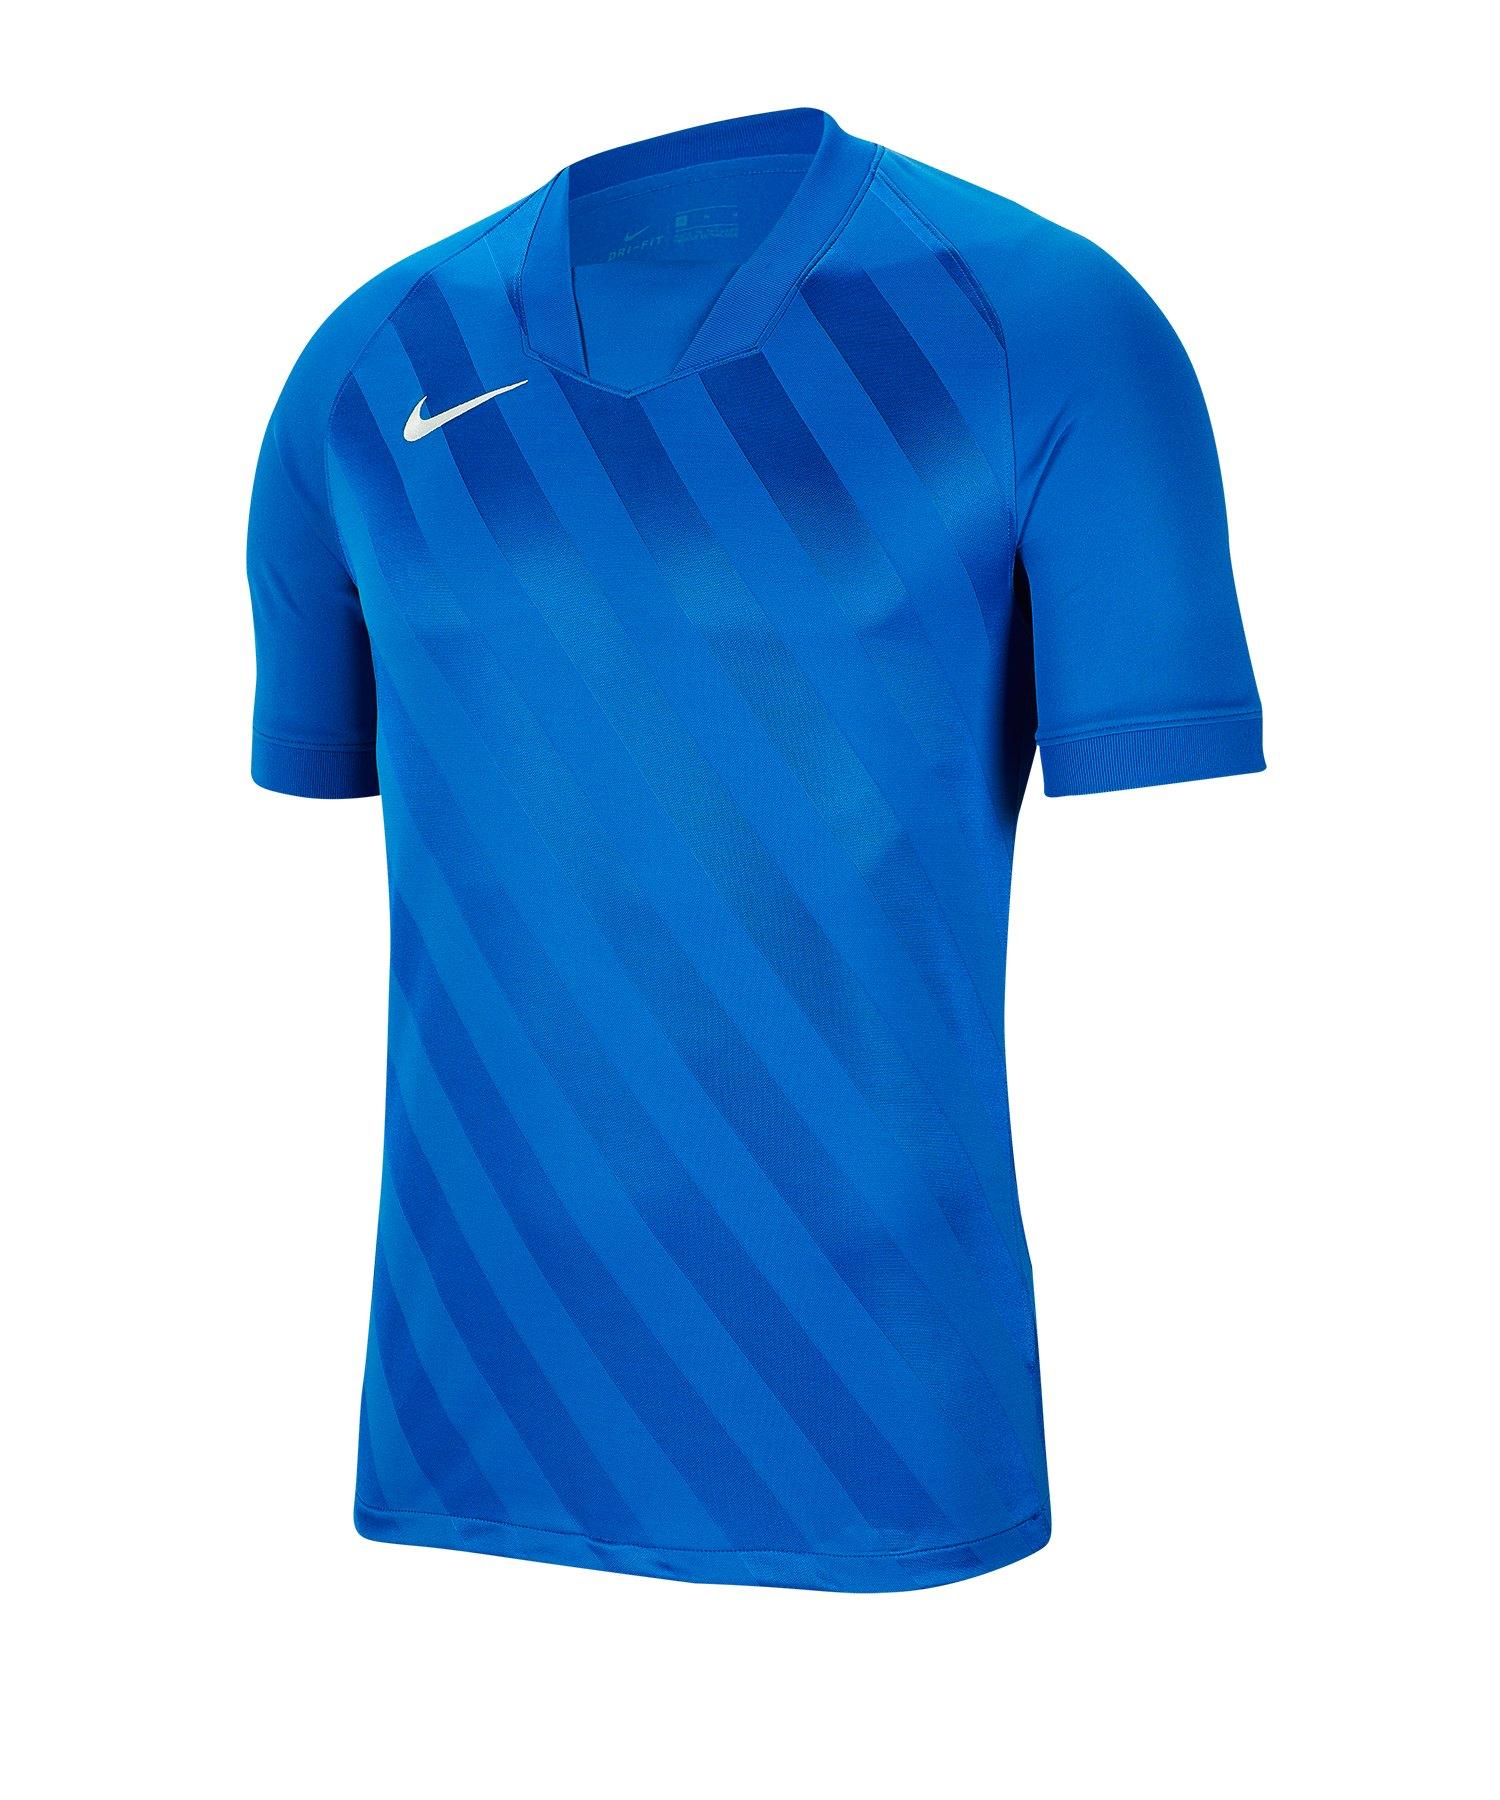 Nike Challenge III Trikot kurzarm Blau F463 - blau